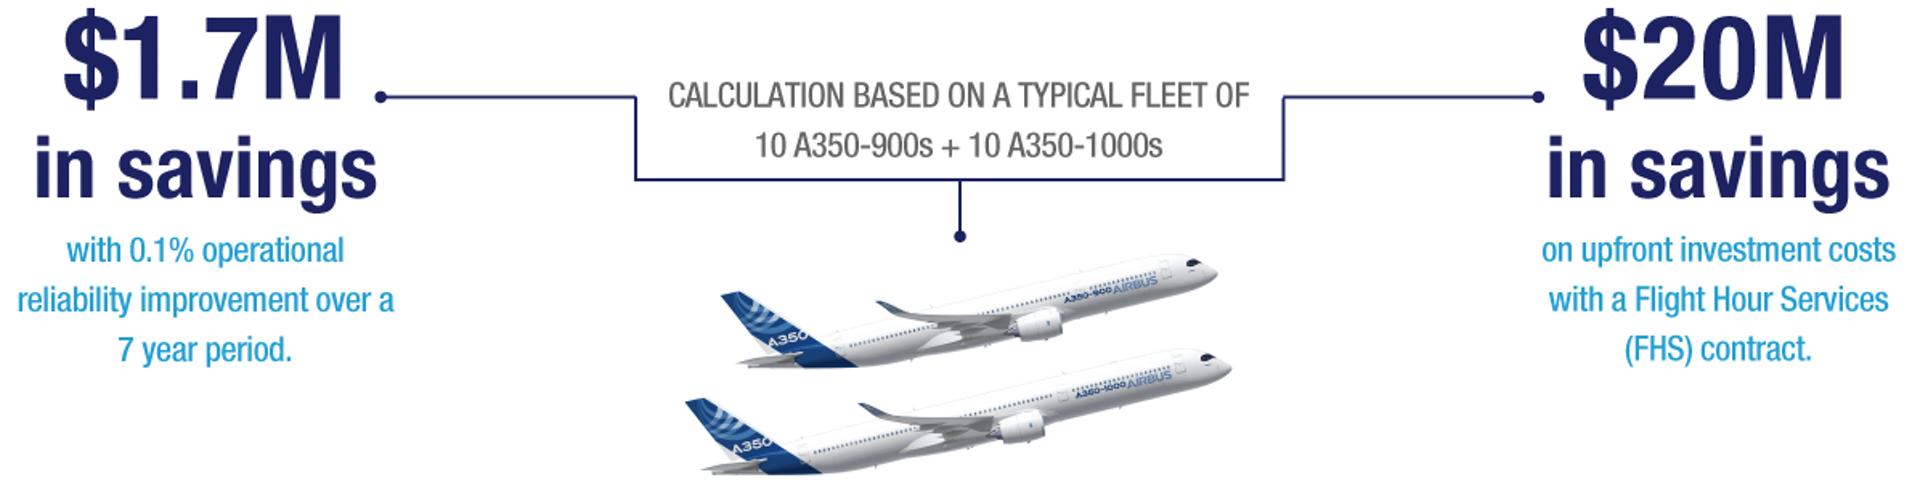 Flight Hour Services (FHS) Savings